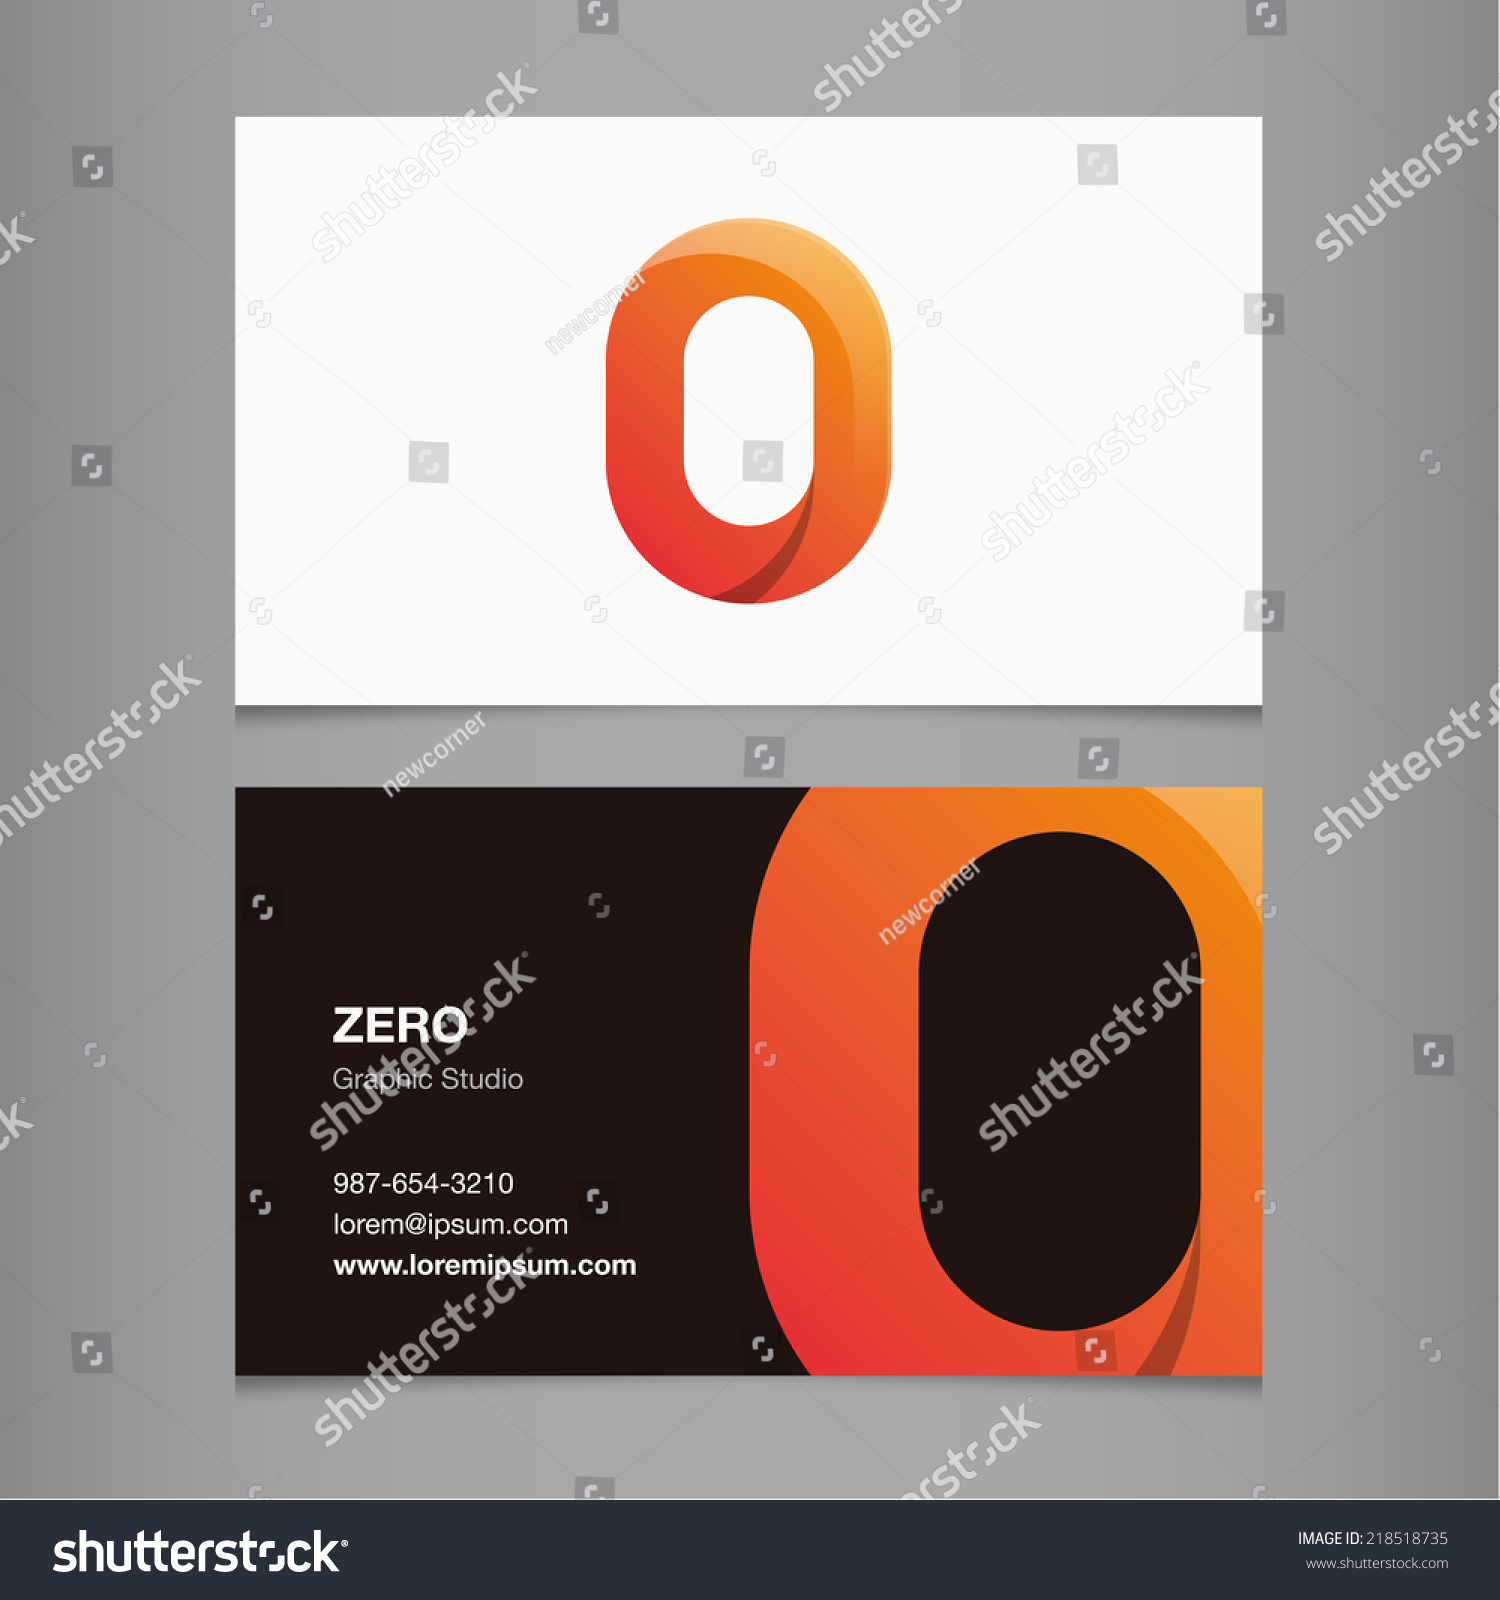 business card number 0 stock vector shutterstock